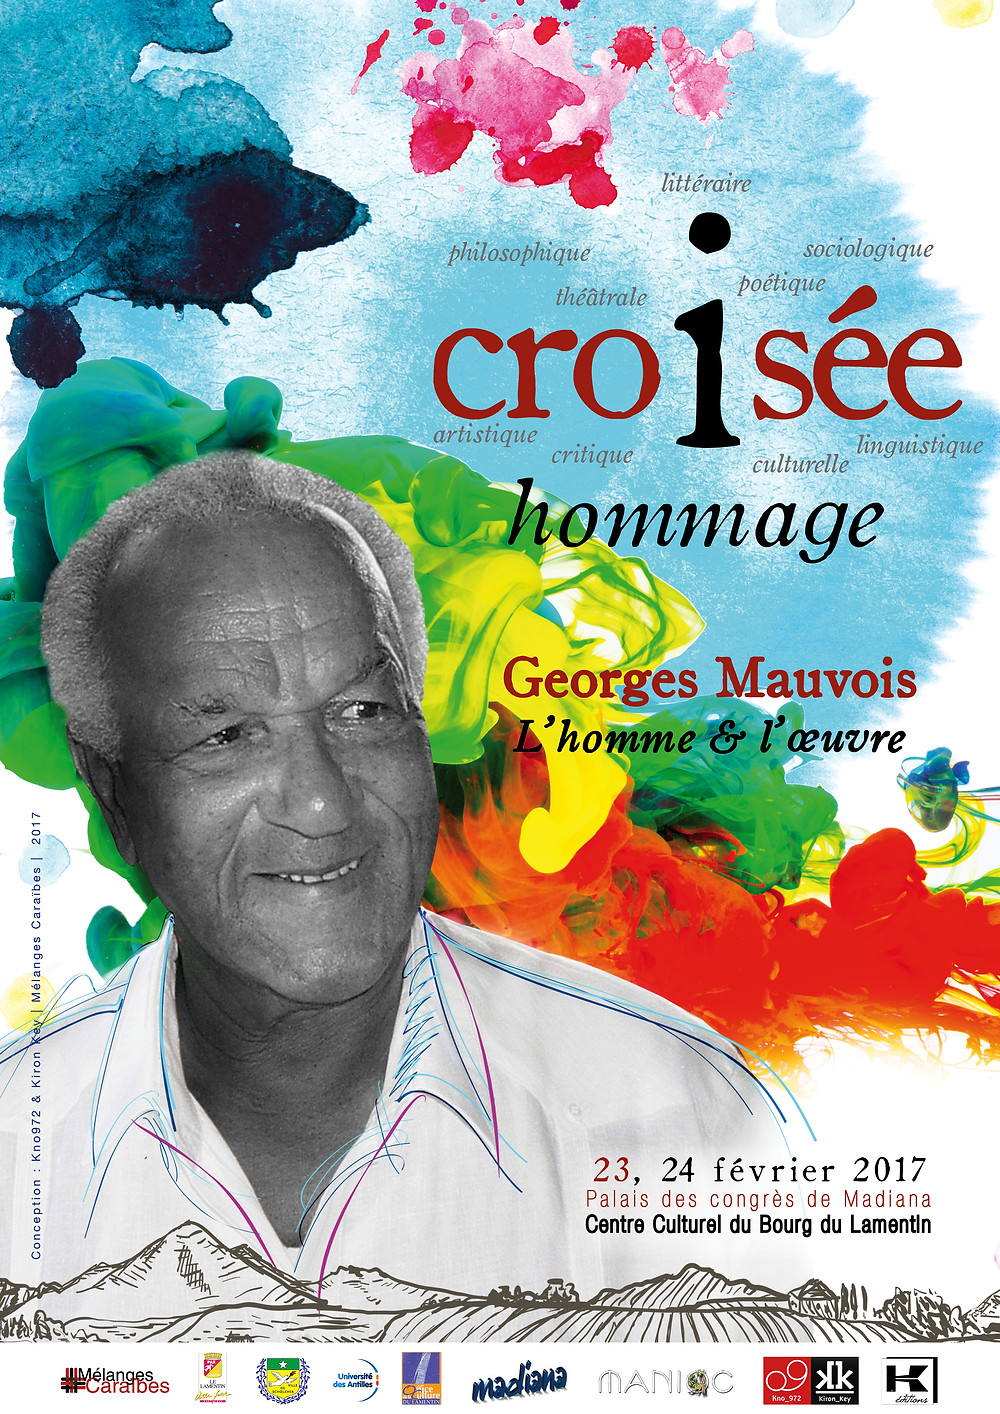 Georges Mauvois